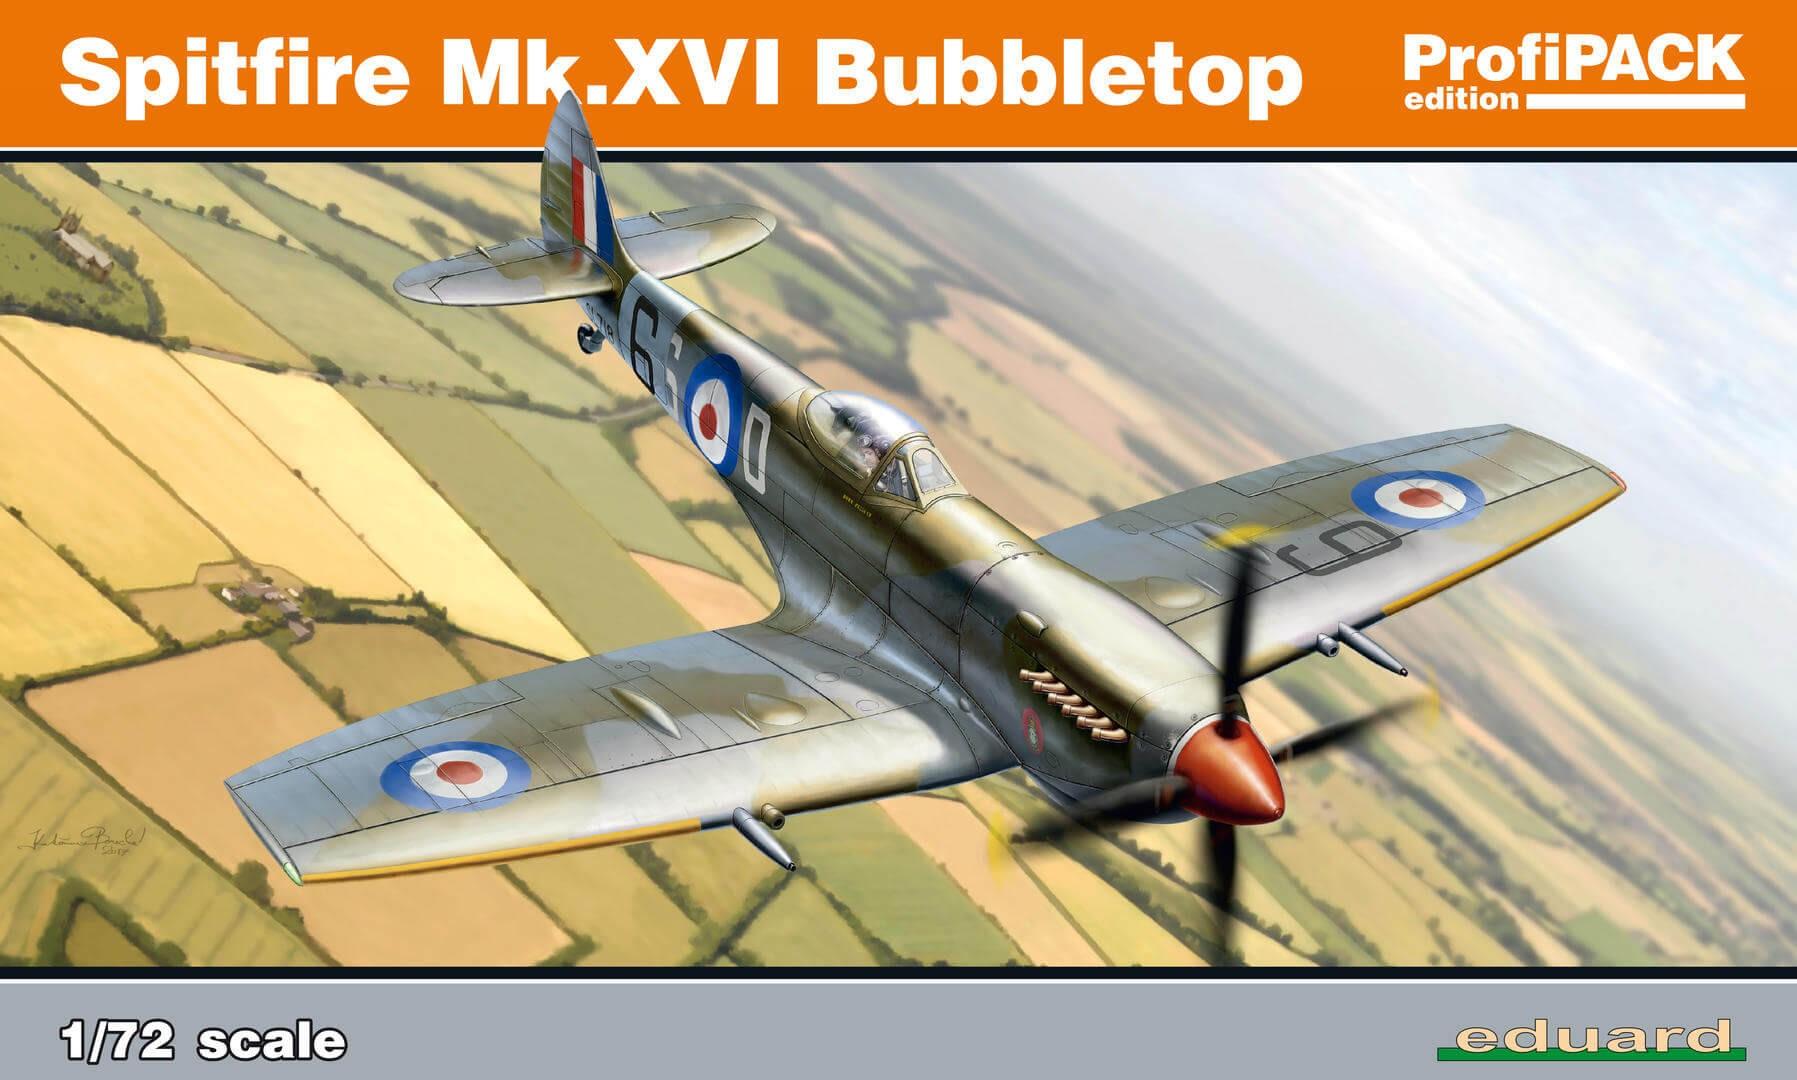 1:72 Spitfire Mk.XVI ProfiPACK Plastic Model Kit